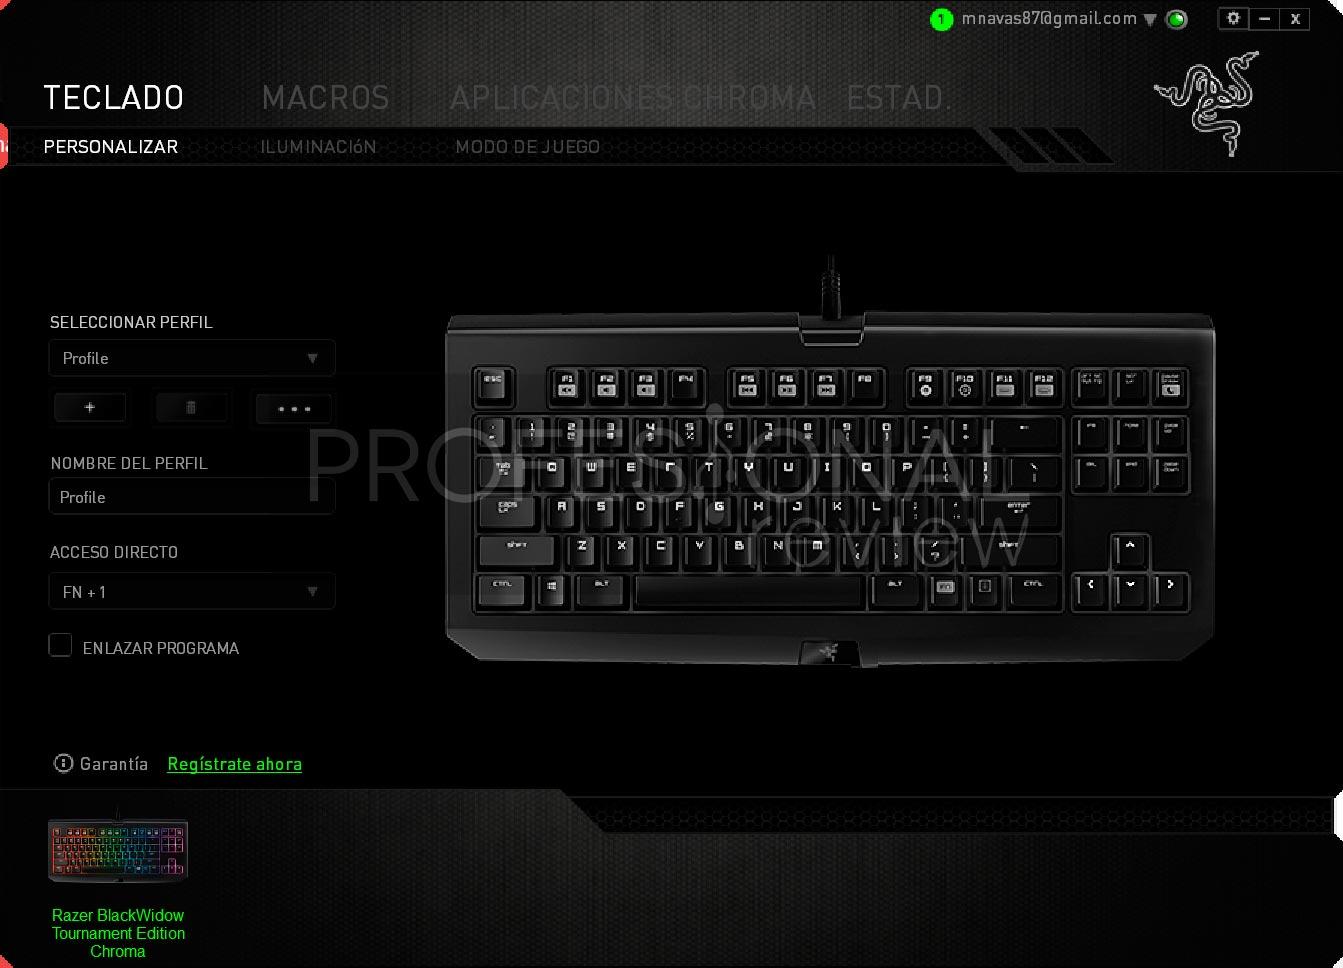 razer-blackwidow-tournament-edition-chroma-software00